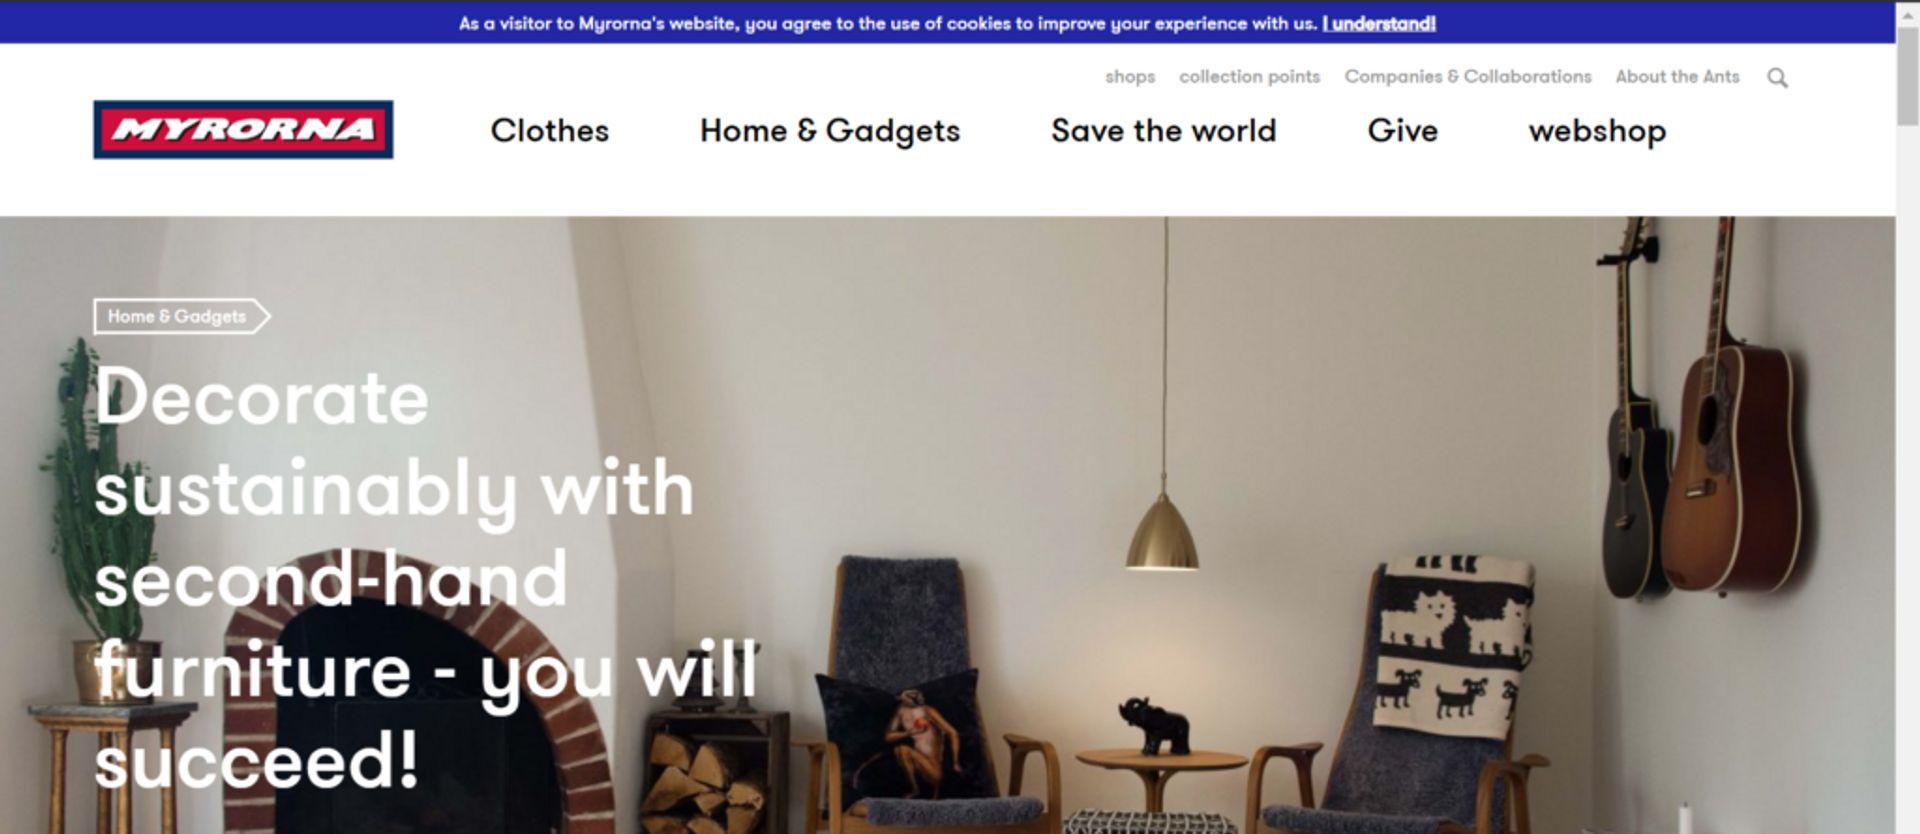 Frontpage of Myrorna's website.